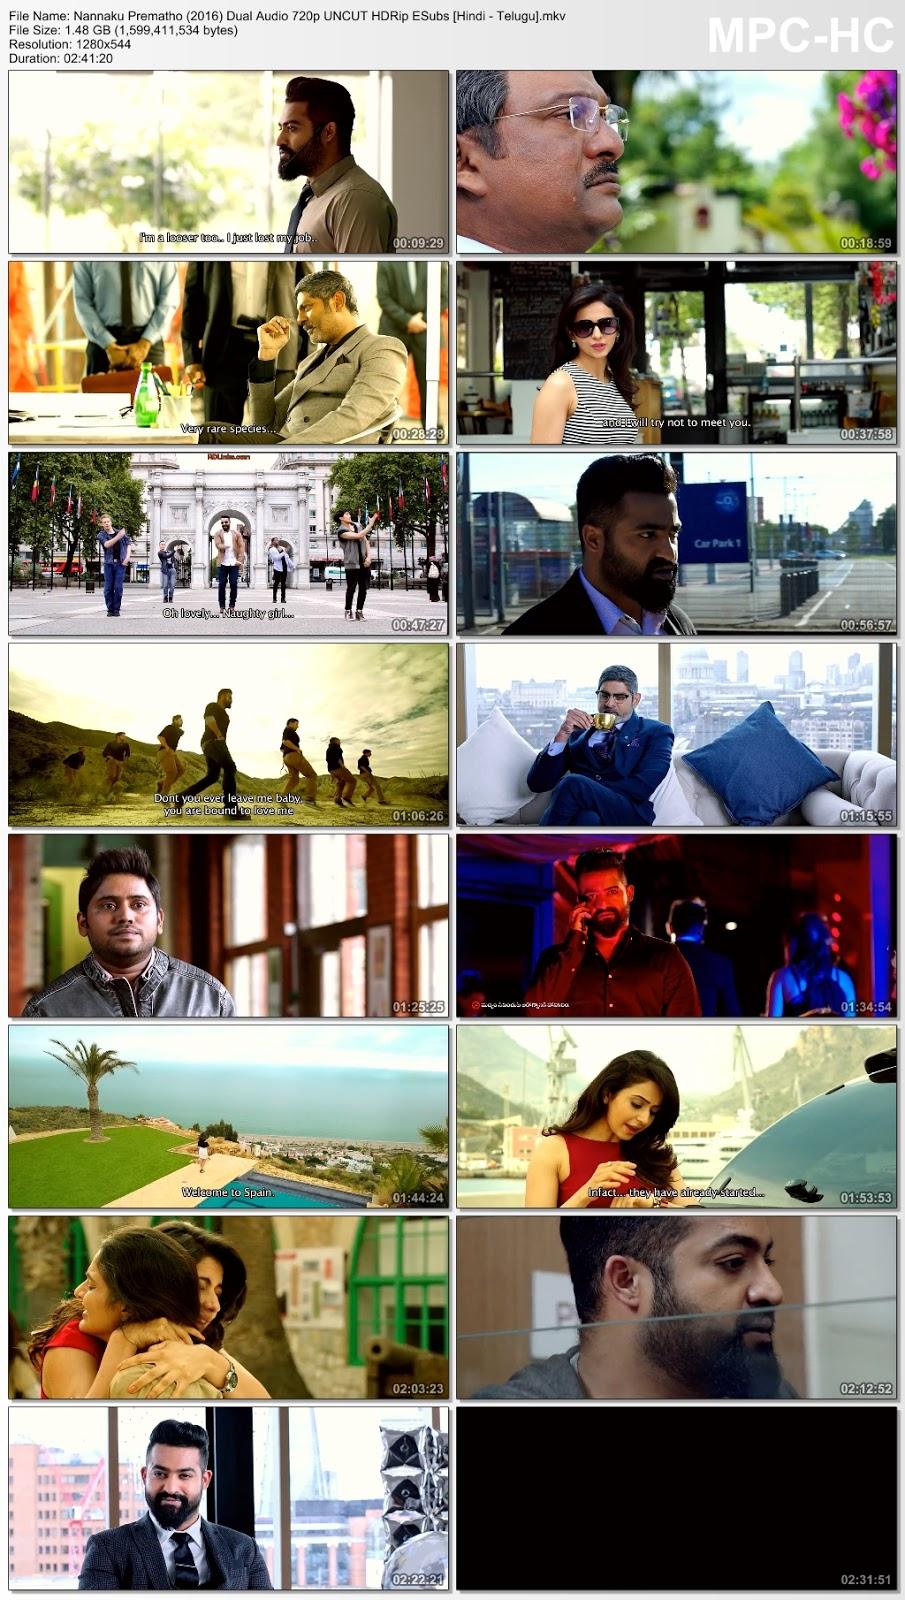 Nannaku Prematho (2016) Dual Audio 720p UNCUT HDRip ESubs [Hindi – Telugu] 1.5GB Desirehub